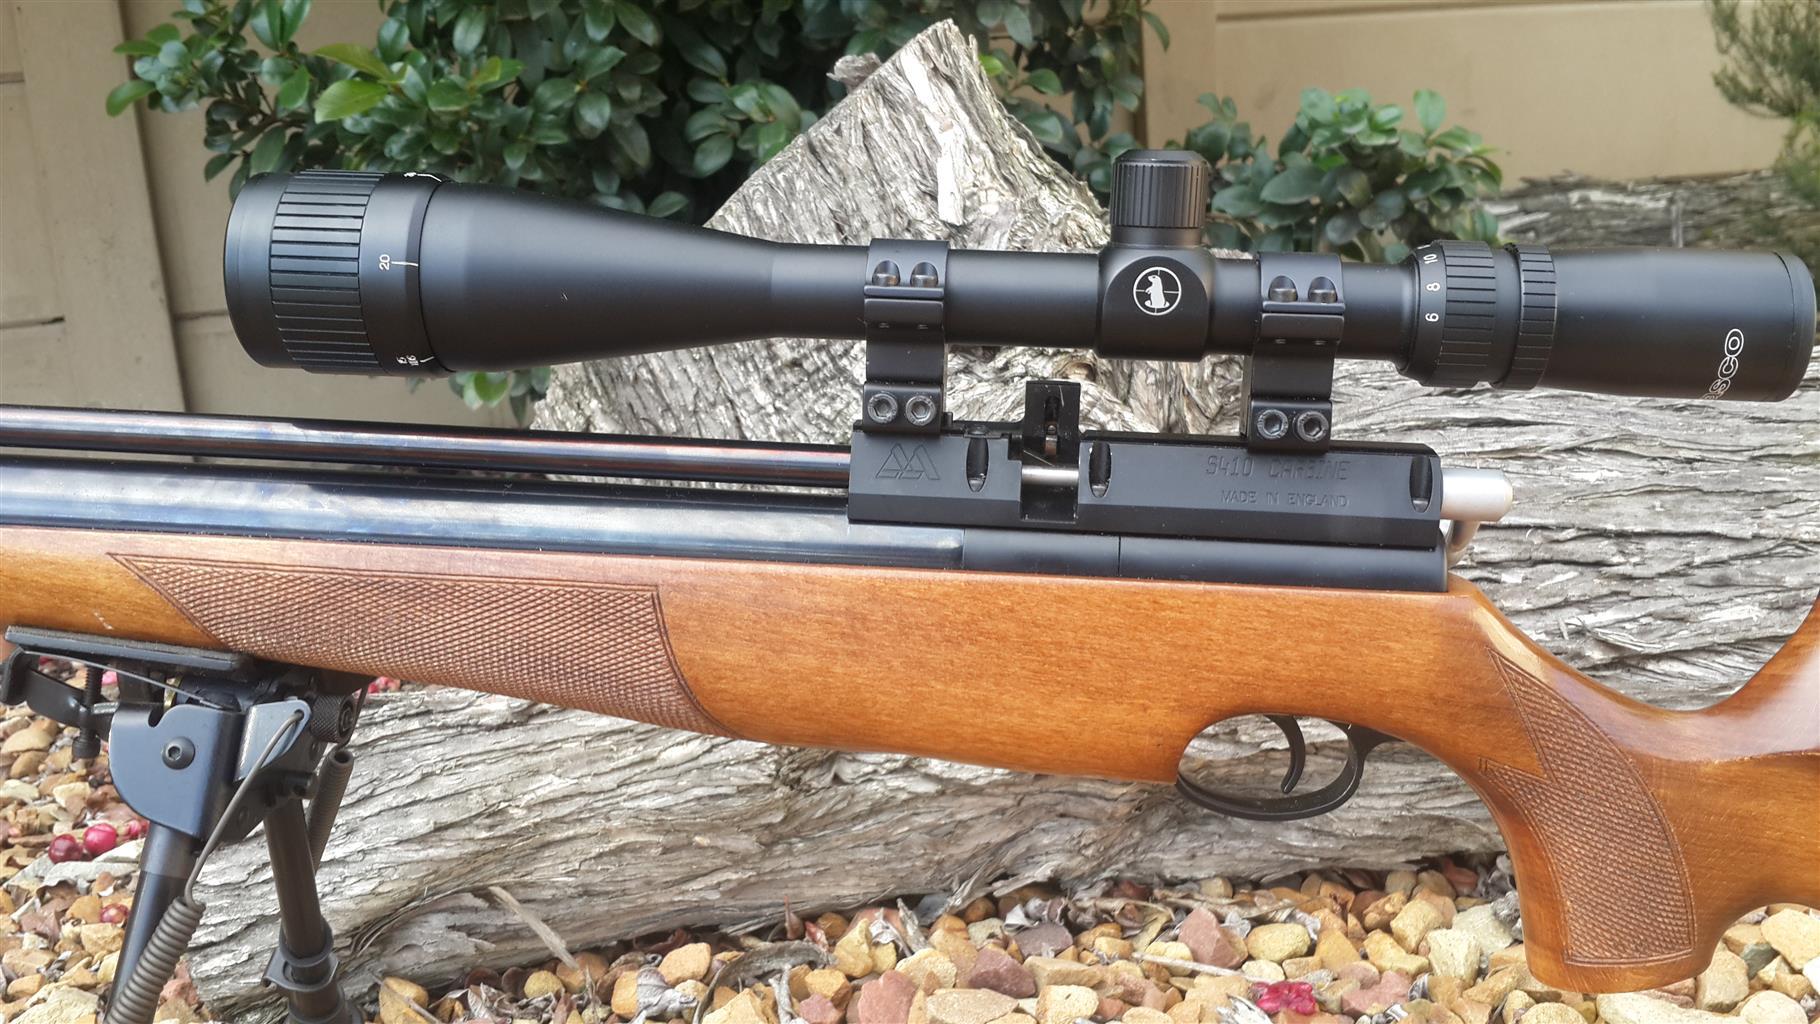 Air arms s410 carbine